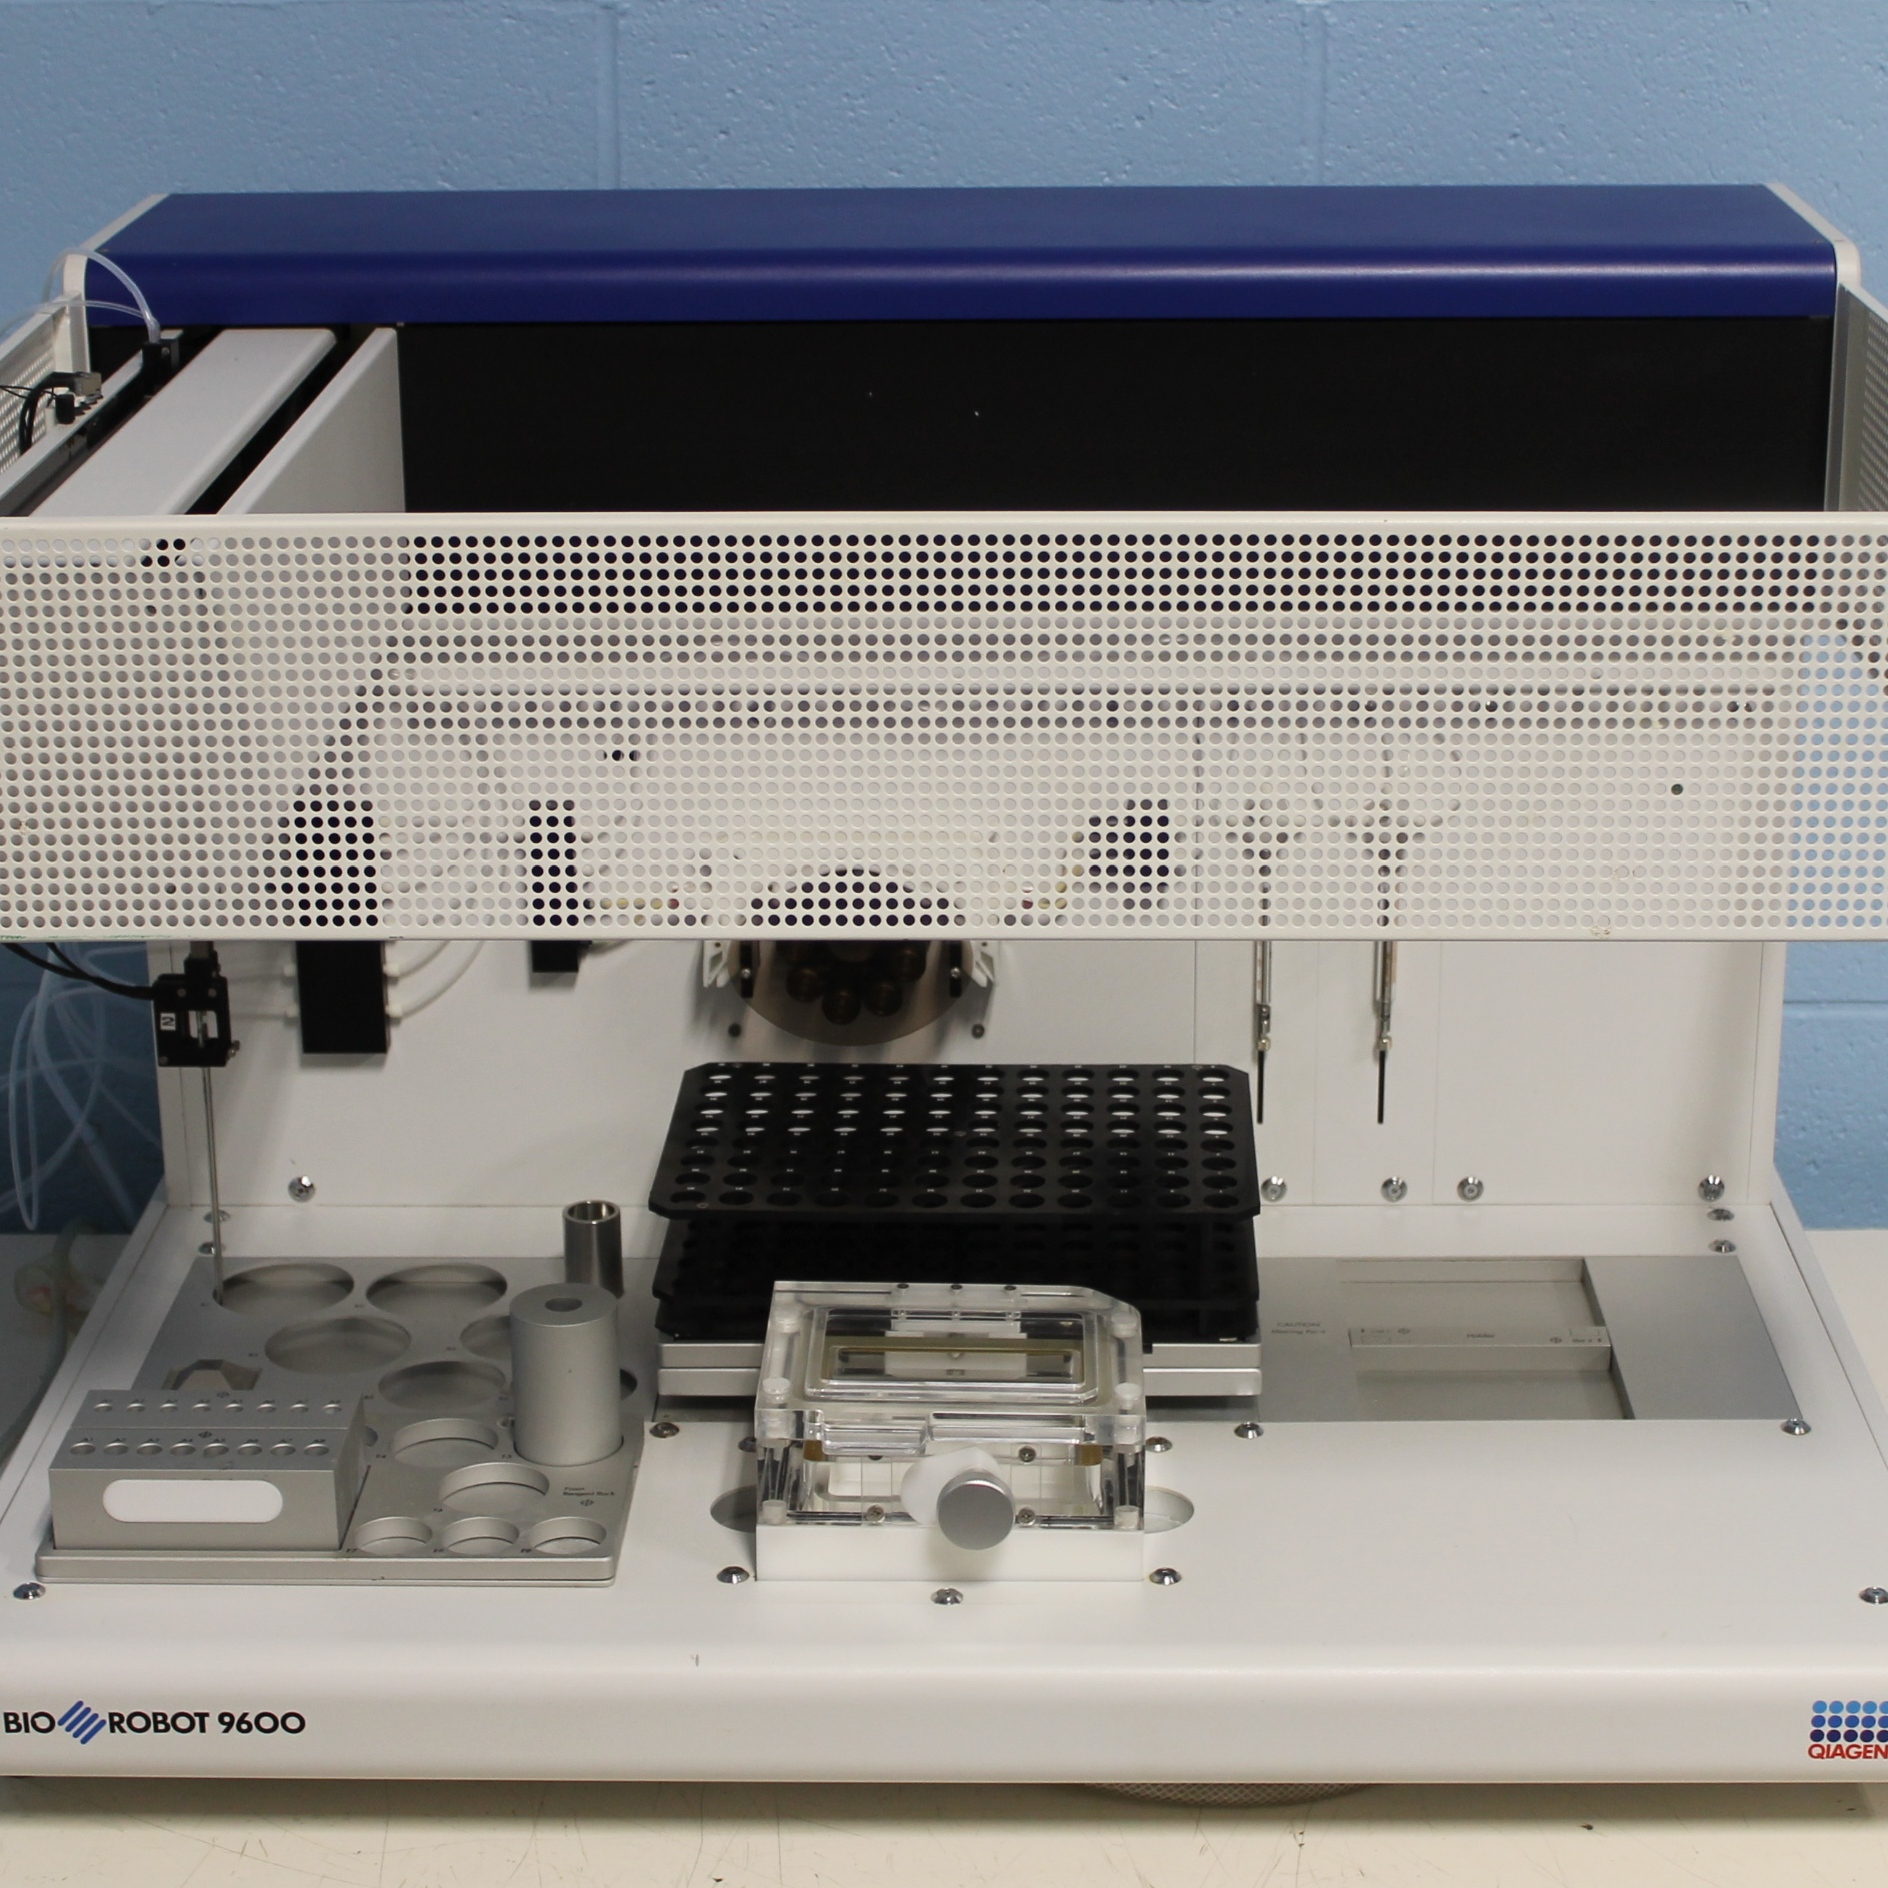 Qiagen BioRobot 9600 Image